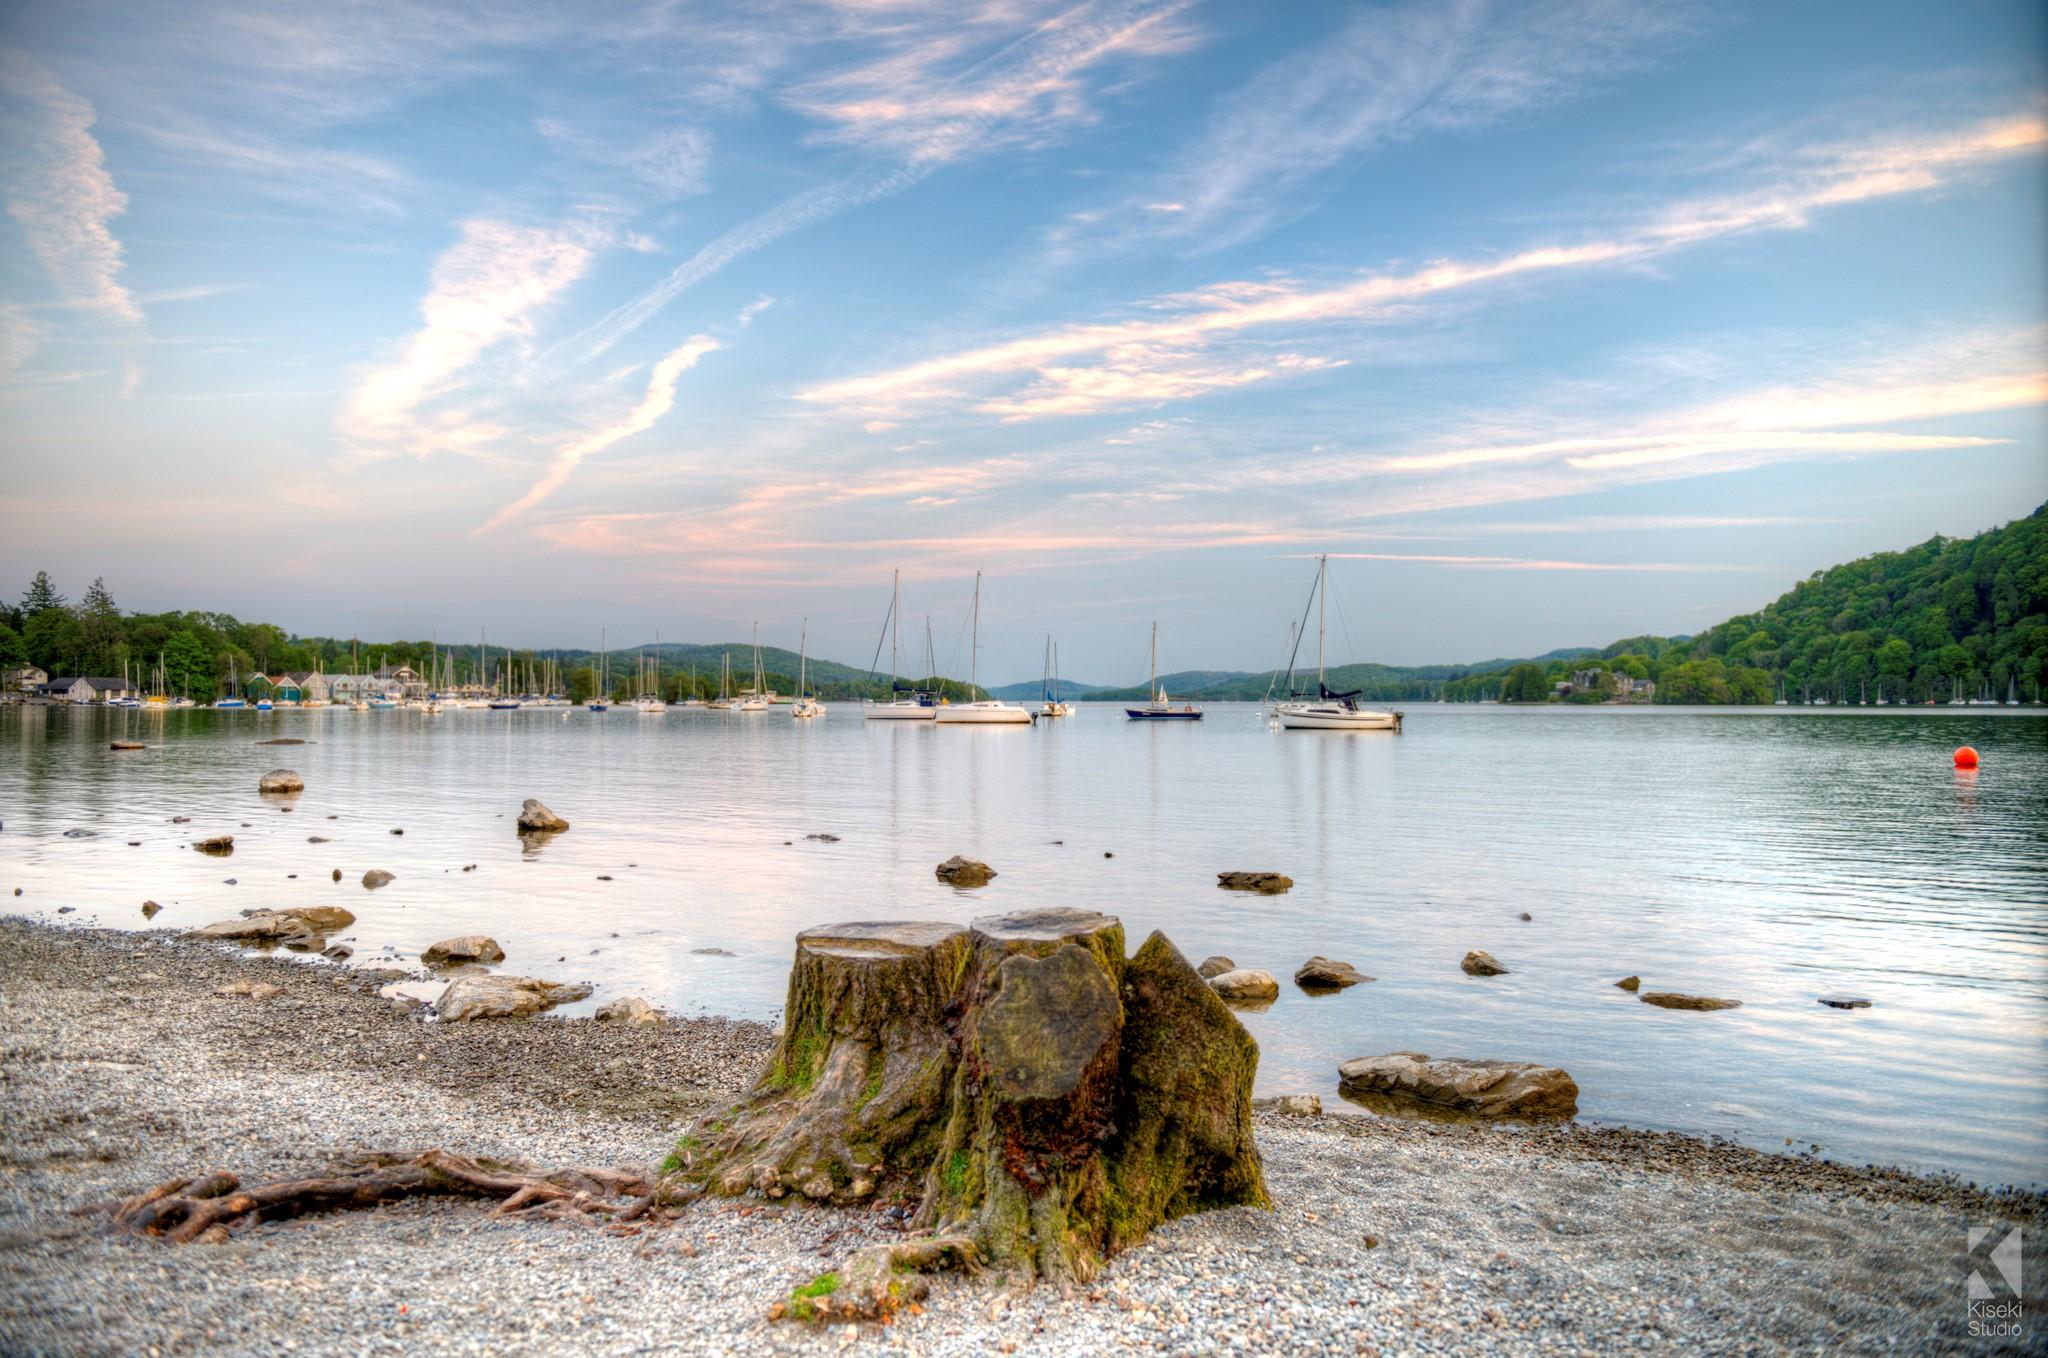 Lake Windermere and a tree stump